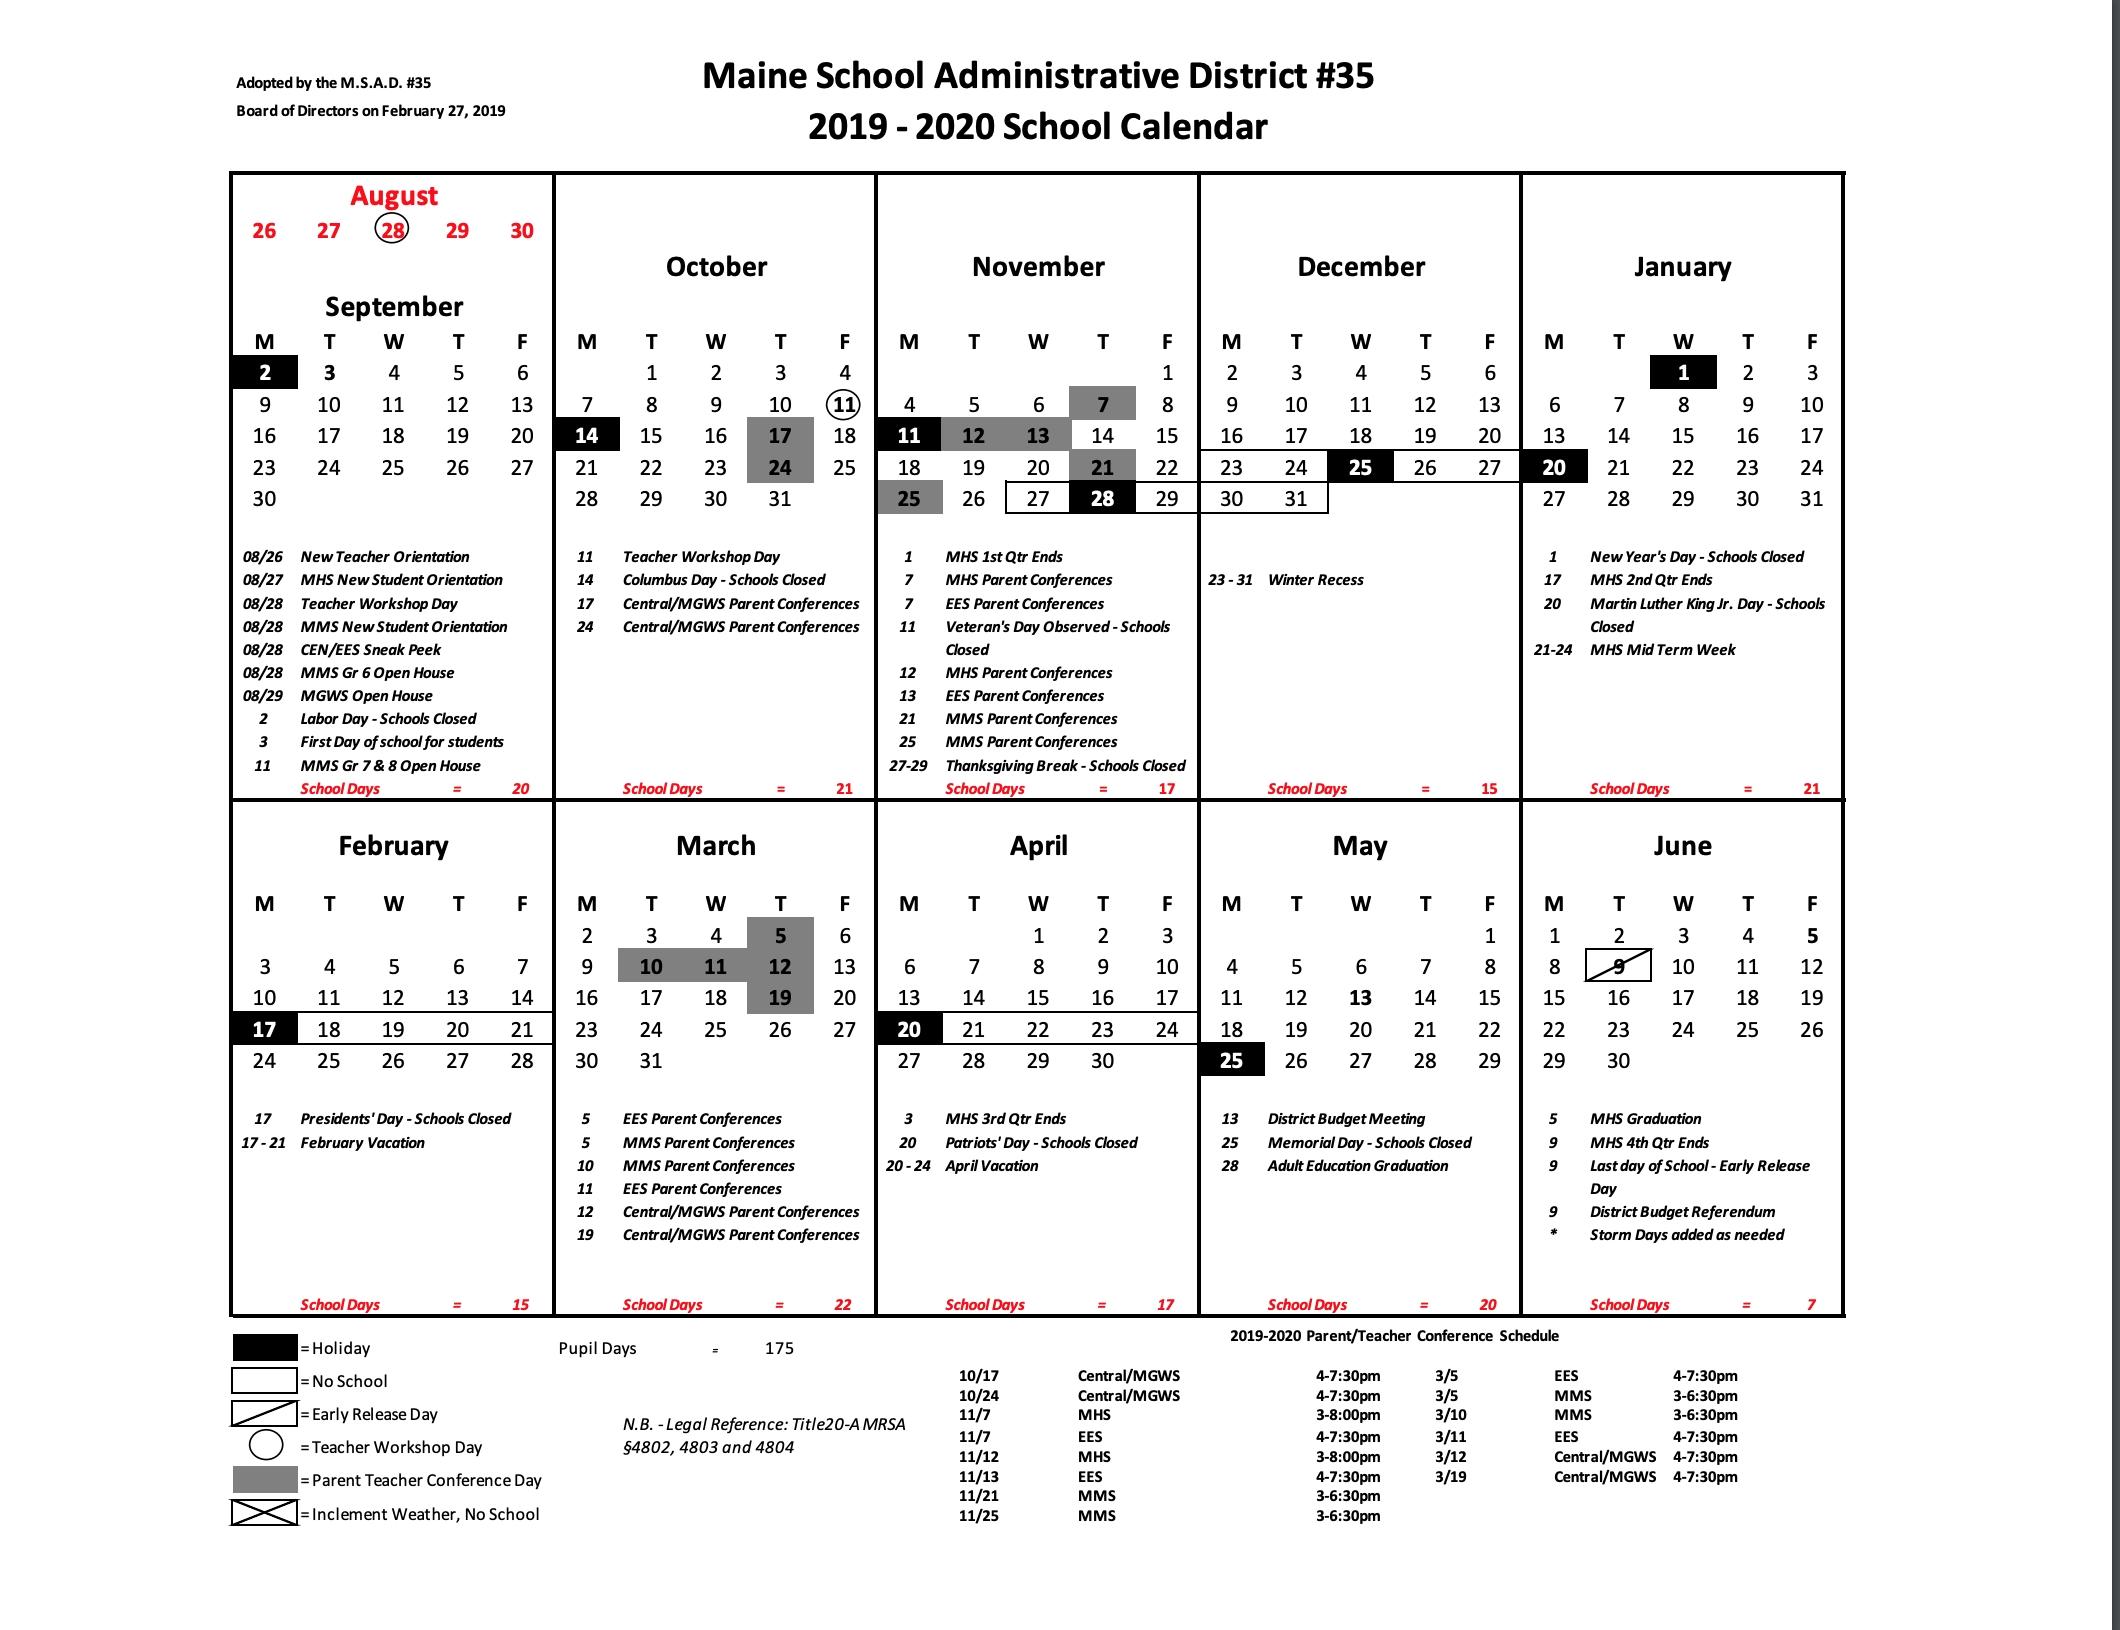 School Calendar For 2019-2020 – Central School_Msad 6 School Calendar